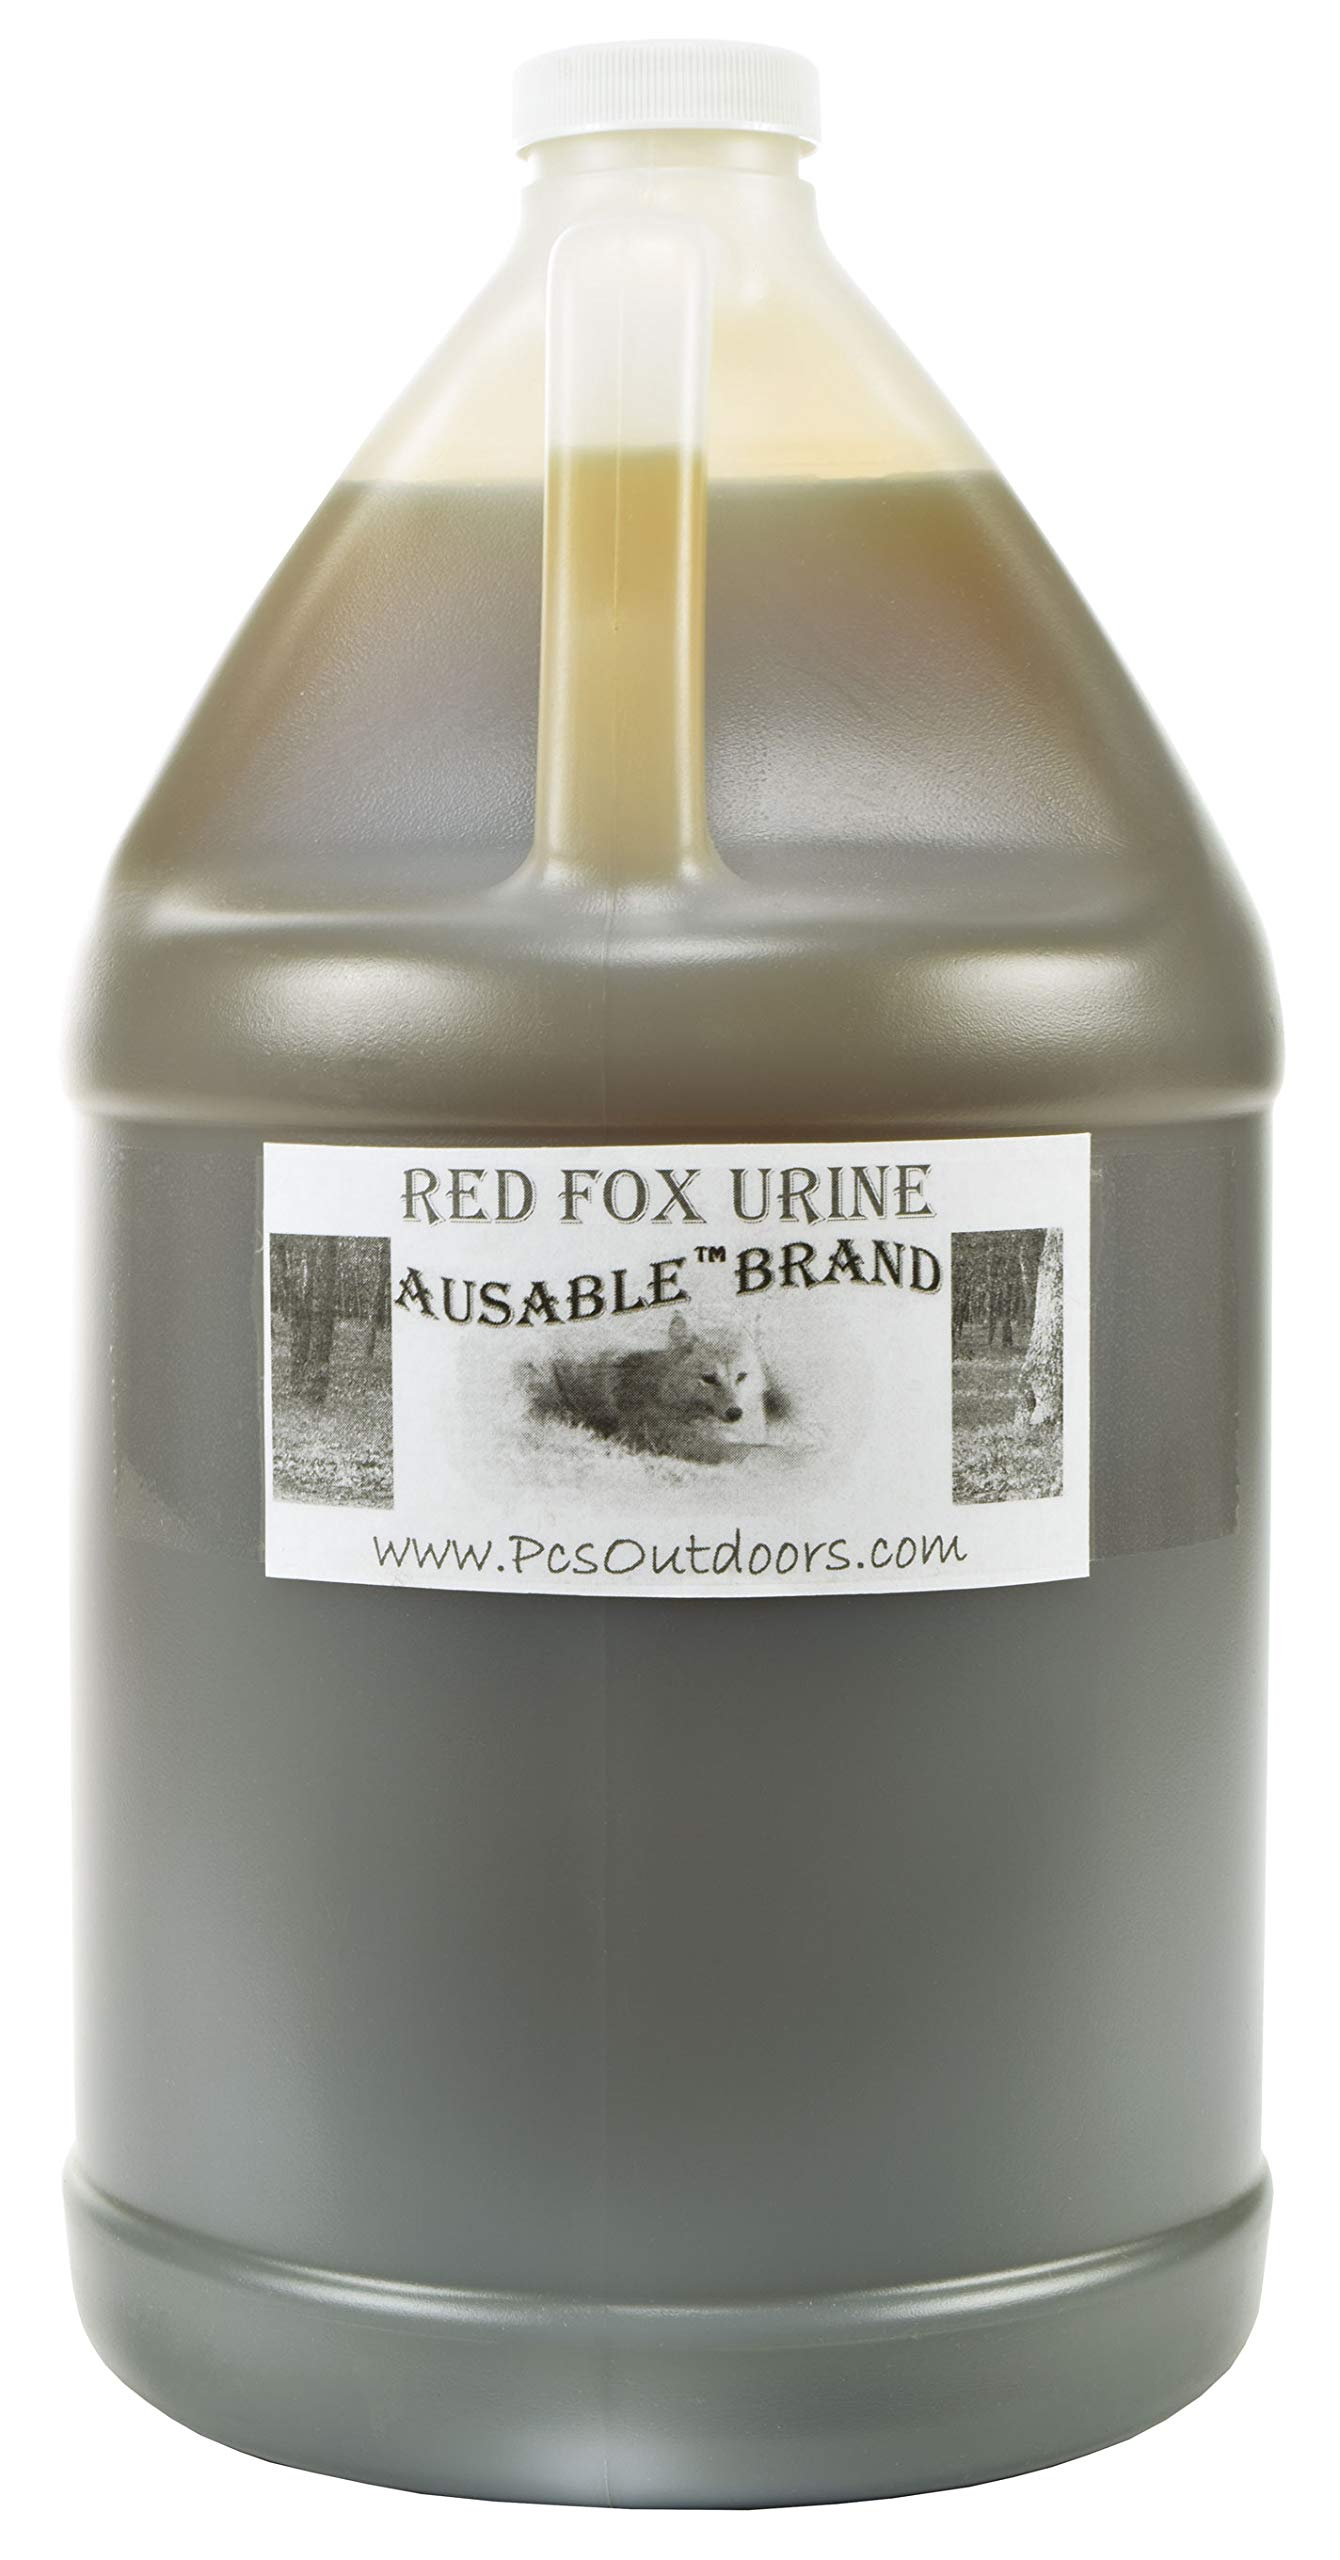 AuSable Brand Pure Red Fox Urine - 1 Gallon